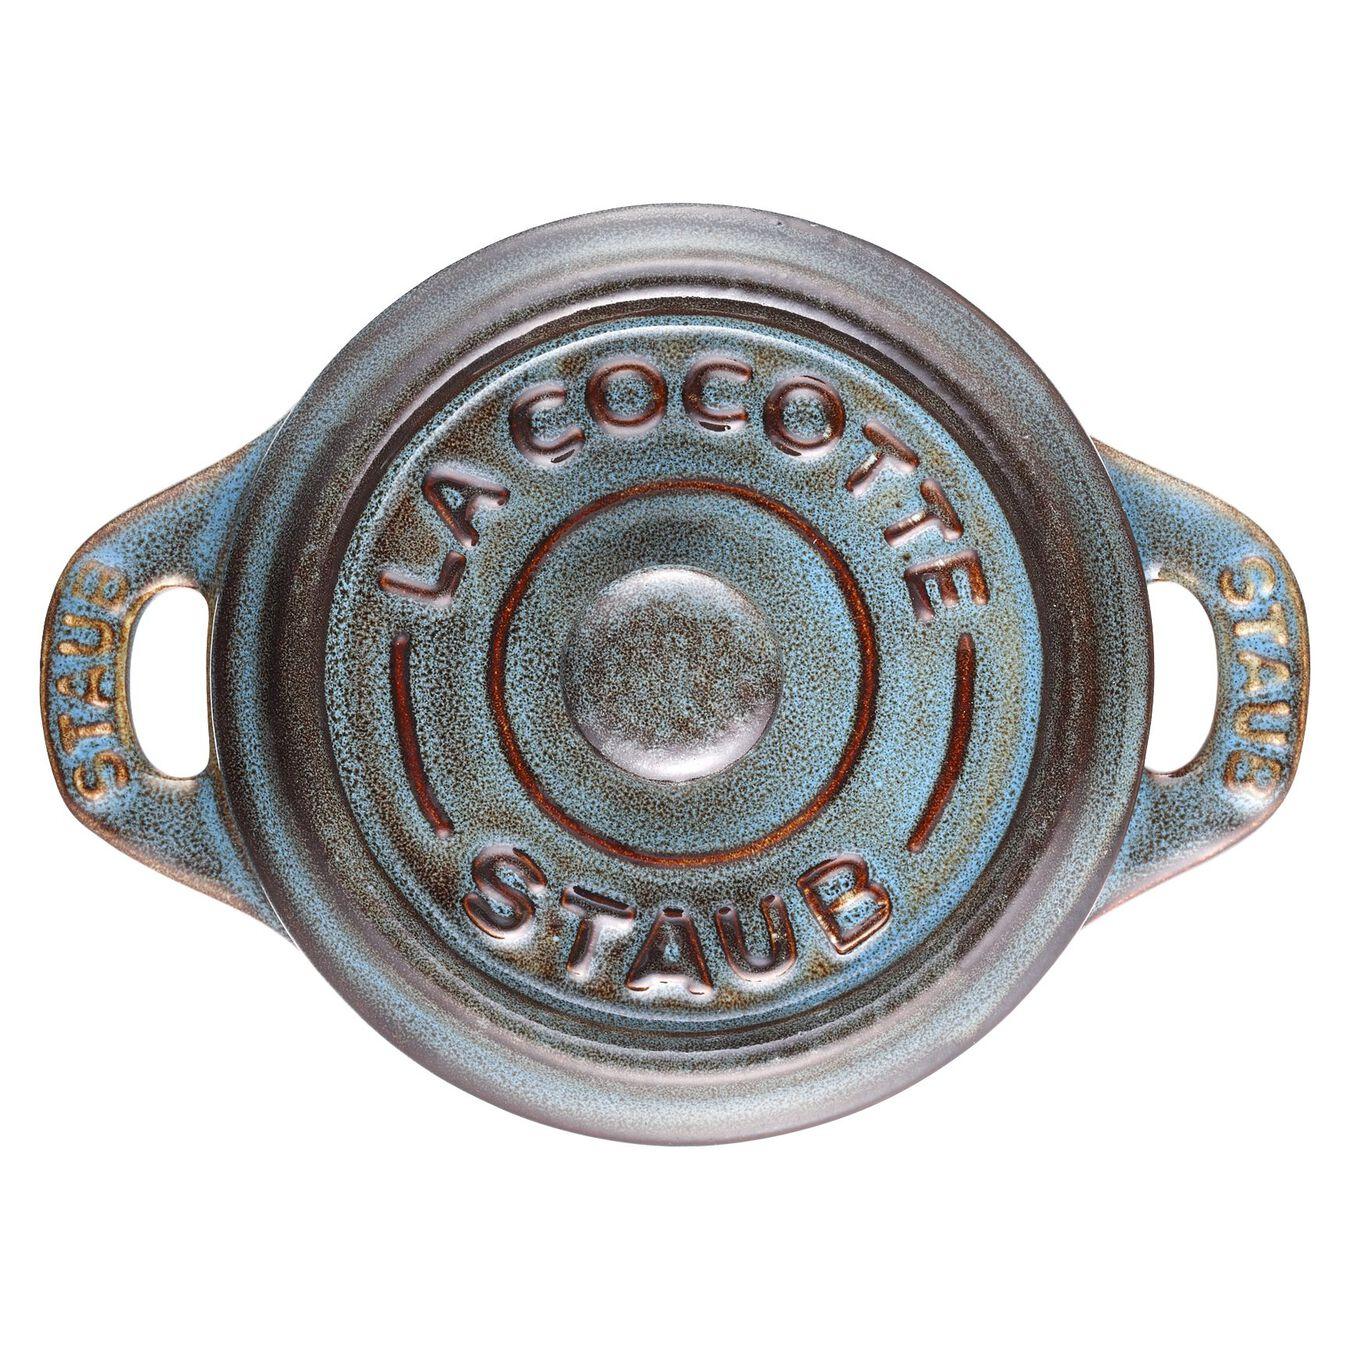 Mini Cocotte 10 cm, Rund, Antikturkis, Stentøj,,large 3